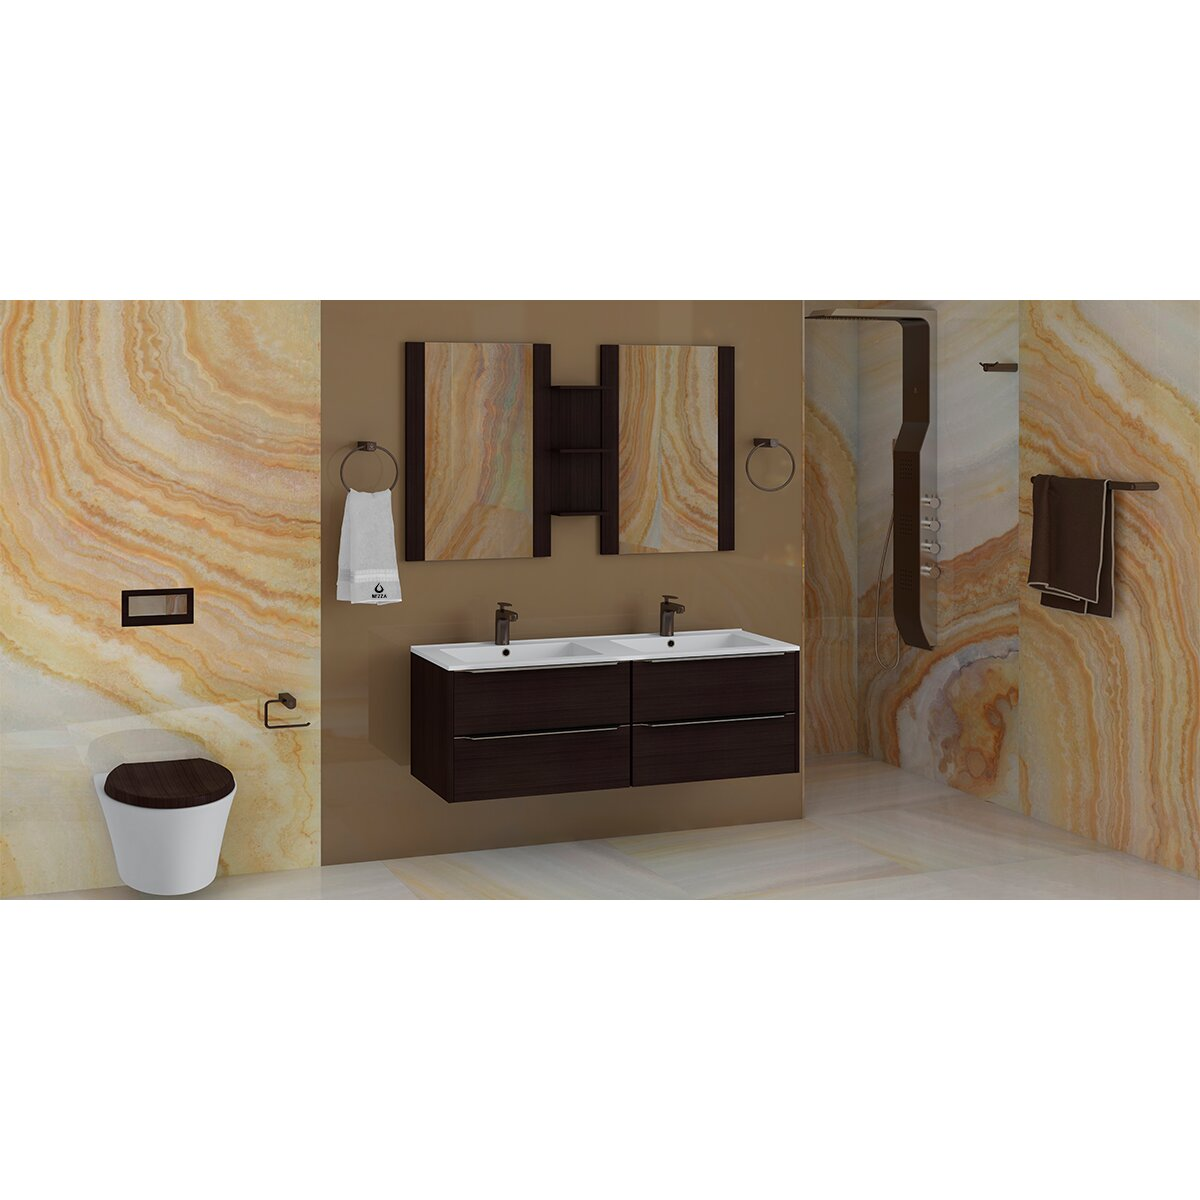 Elegant Modern Bathroom Hardware Set Bath Accessories Towel Bar Ring Toilet